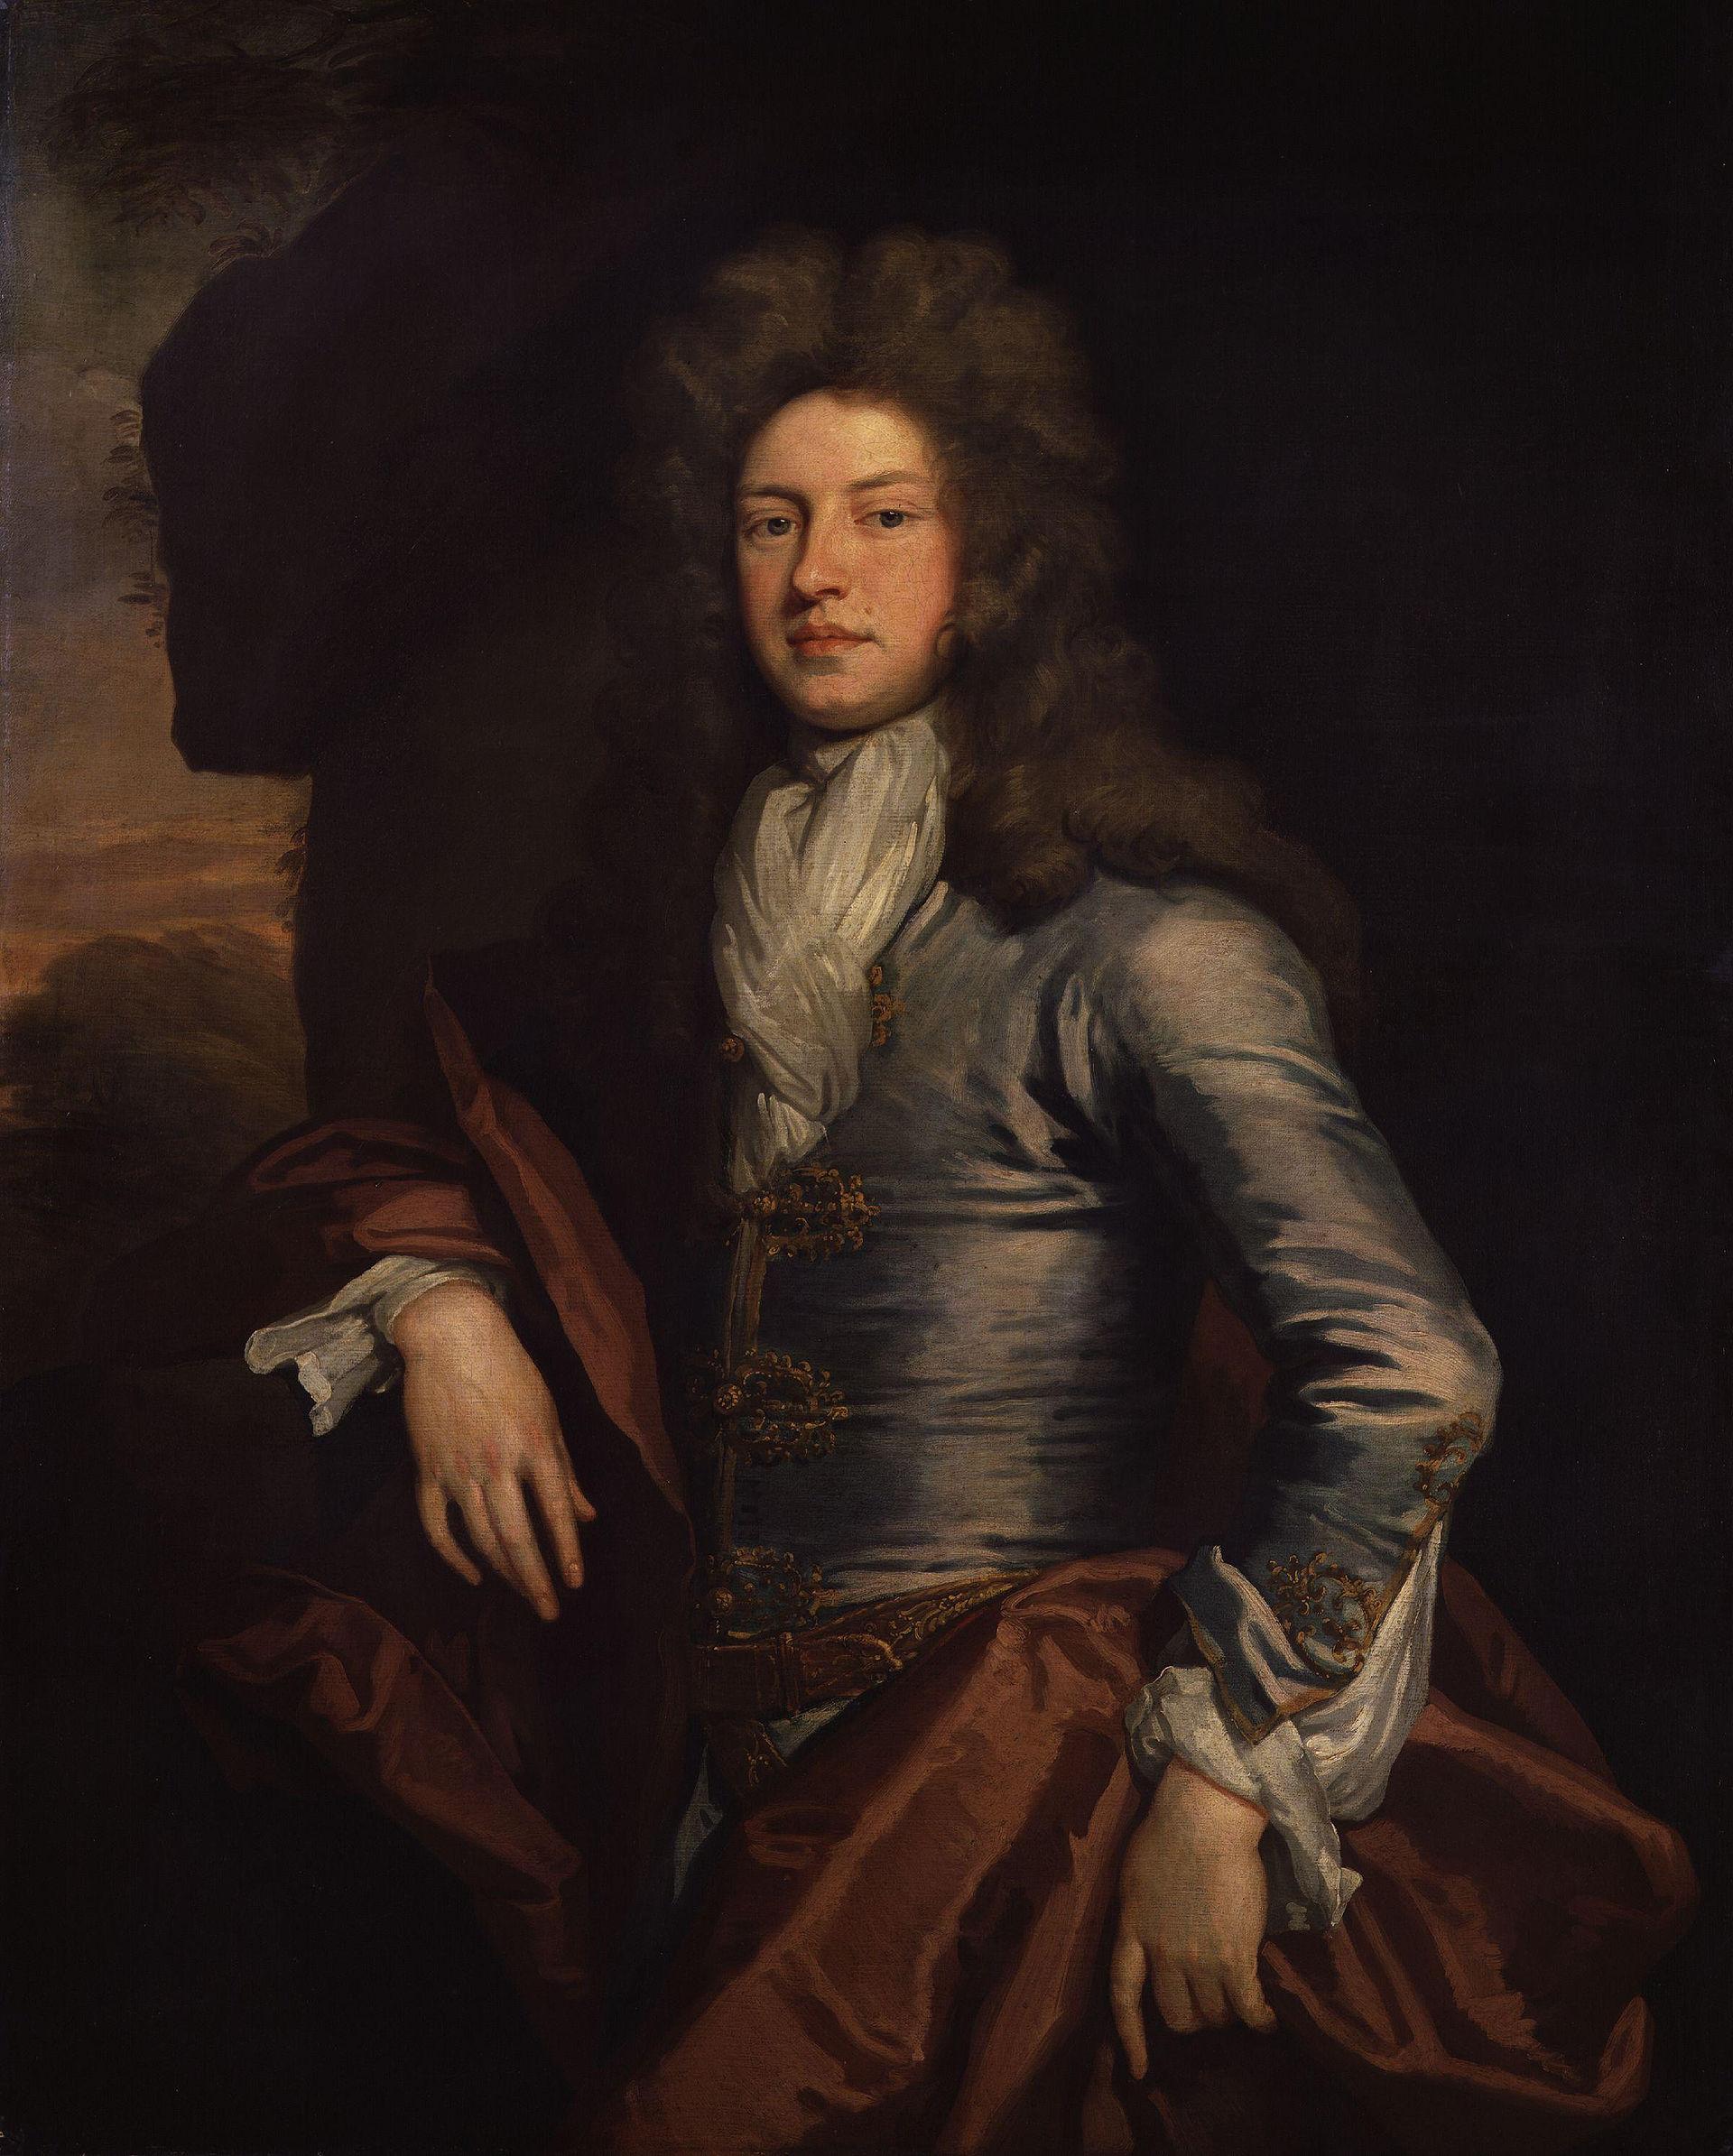 Charles_Montagu,_1st_Earl_of_Halifax_by_Sir_Godfrey_Kneller,_Bt